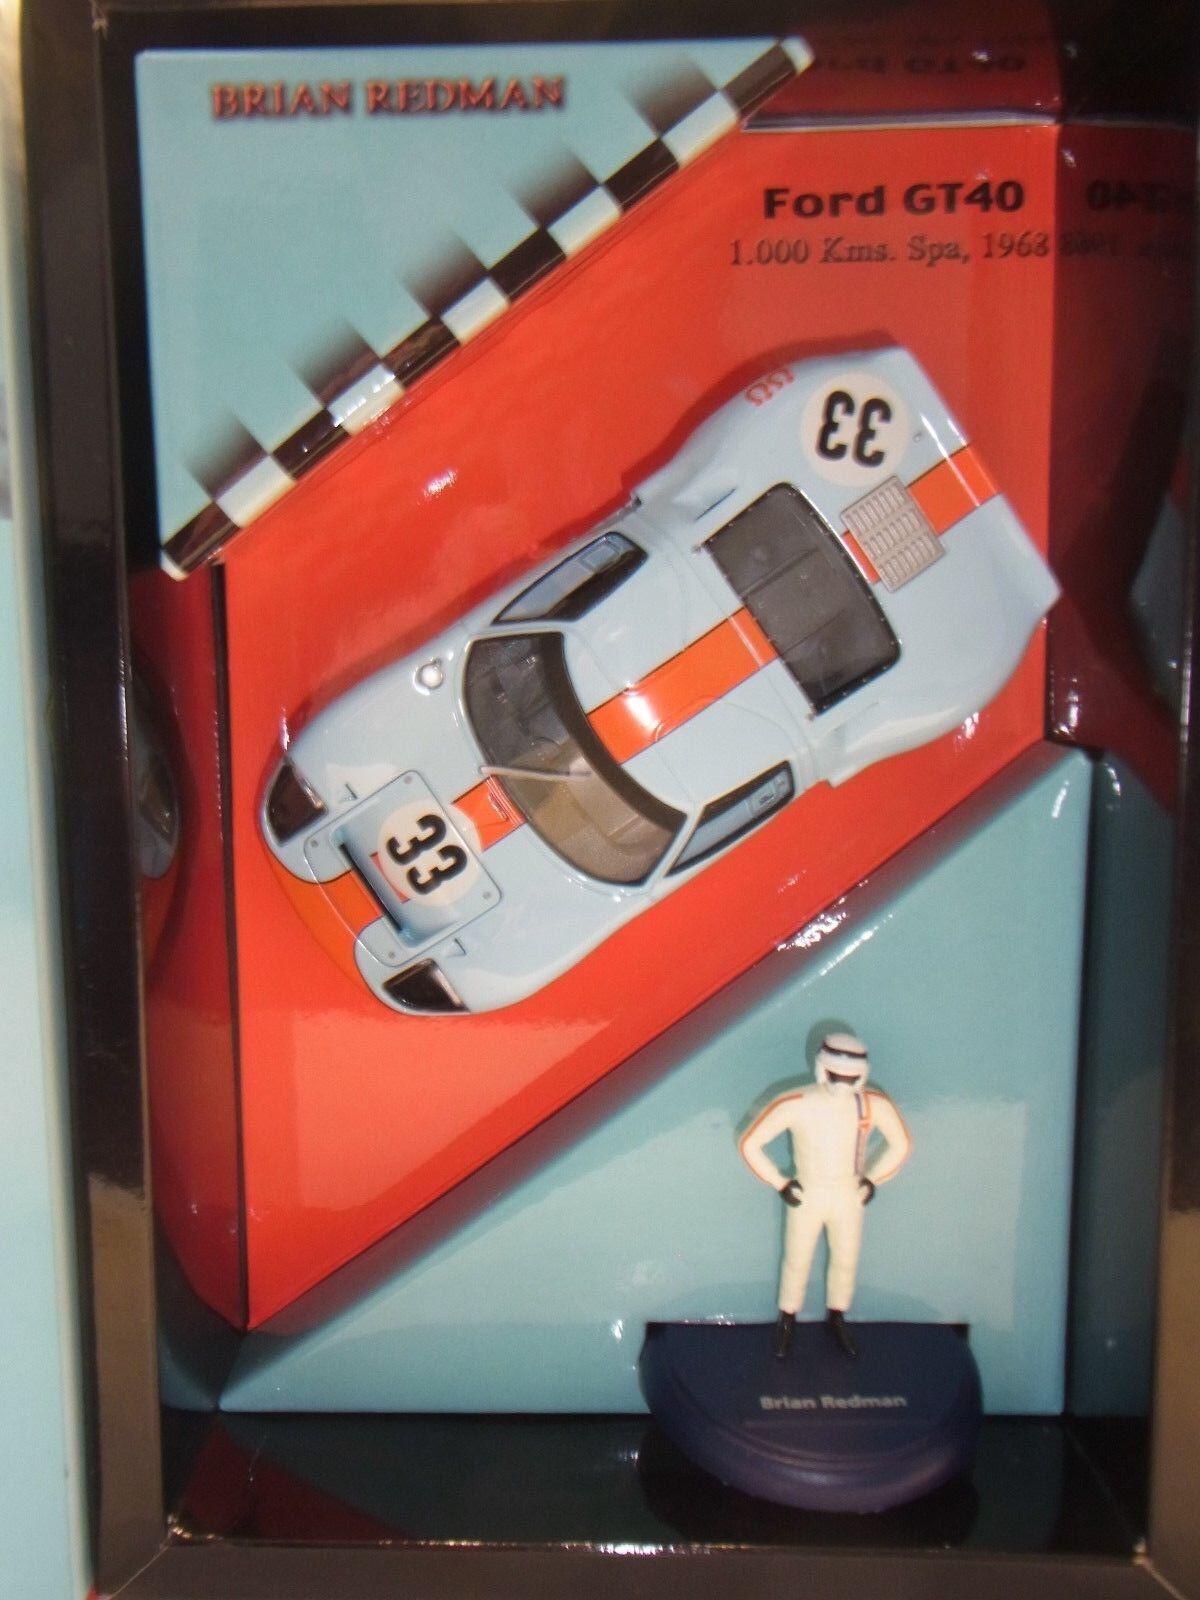 FLY FORD GT40 1000KM SPA 1968 (B) . rossoman fy96039 (F) . per pista auto 1 3 2